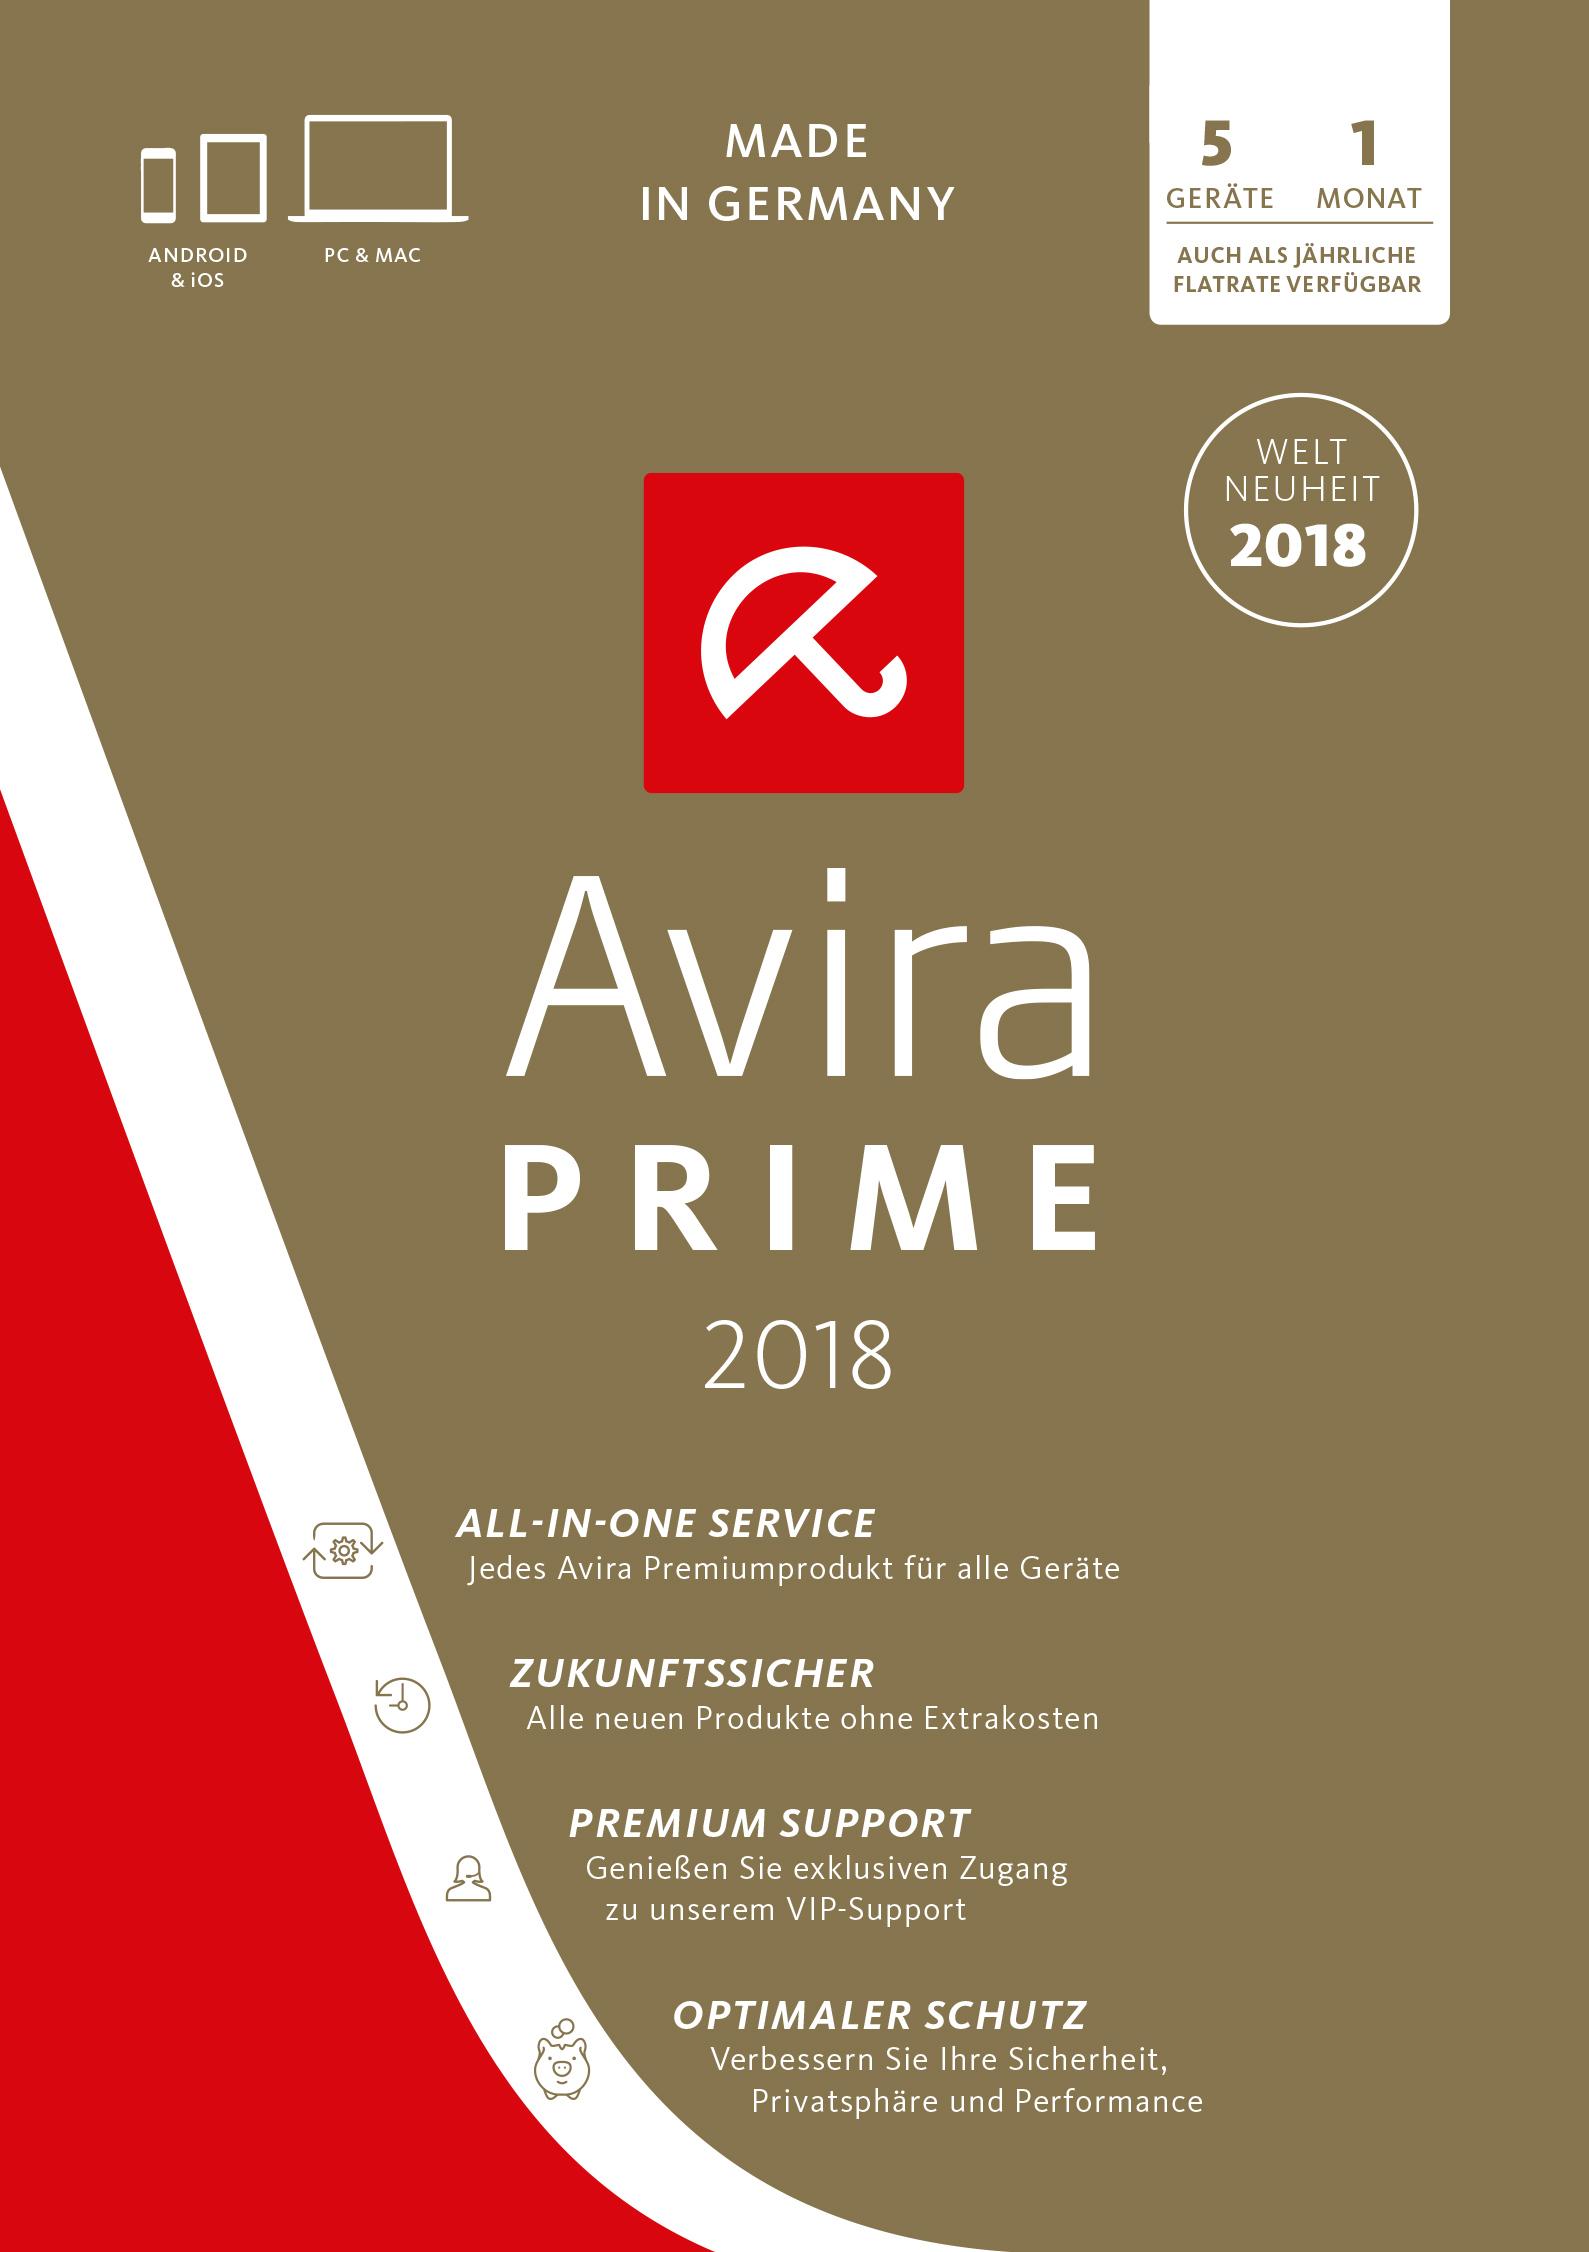 Avira Prime Edition 2018 / All-in-one: Antivirus Pro & Tuning Software inkl. Avira Phantom VPN Pro (Monatslizenz) für 1 User - 5 Geräte / Download für Windows (7, 8, 8.1, 10), Mac, Android & iOS [Online Code]